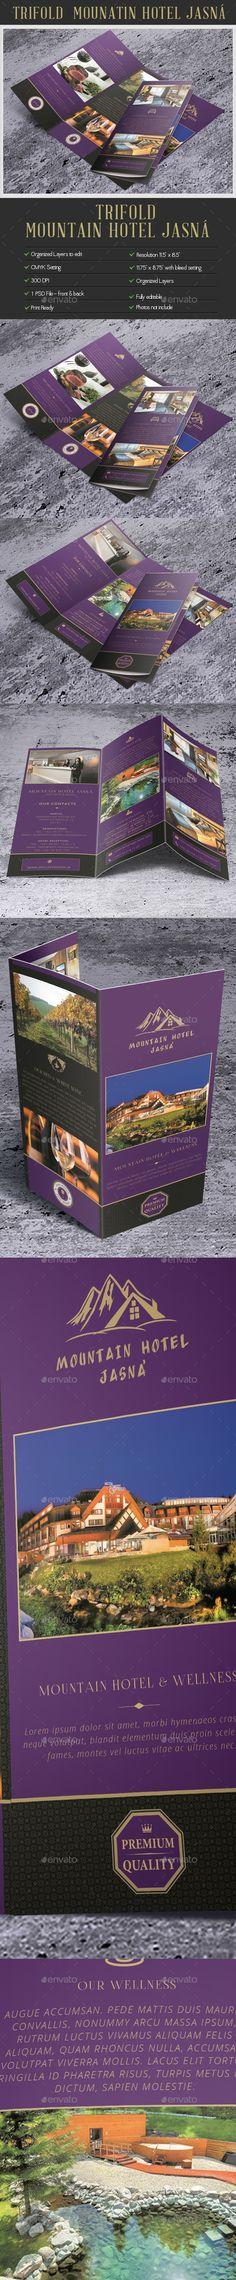 Creative TriFold Brochure Mountain Hotel Jasná